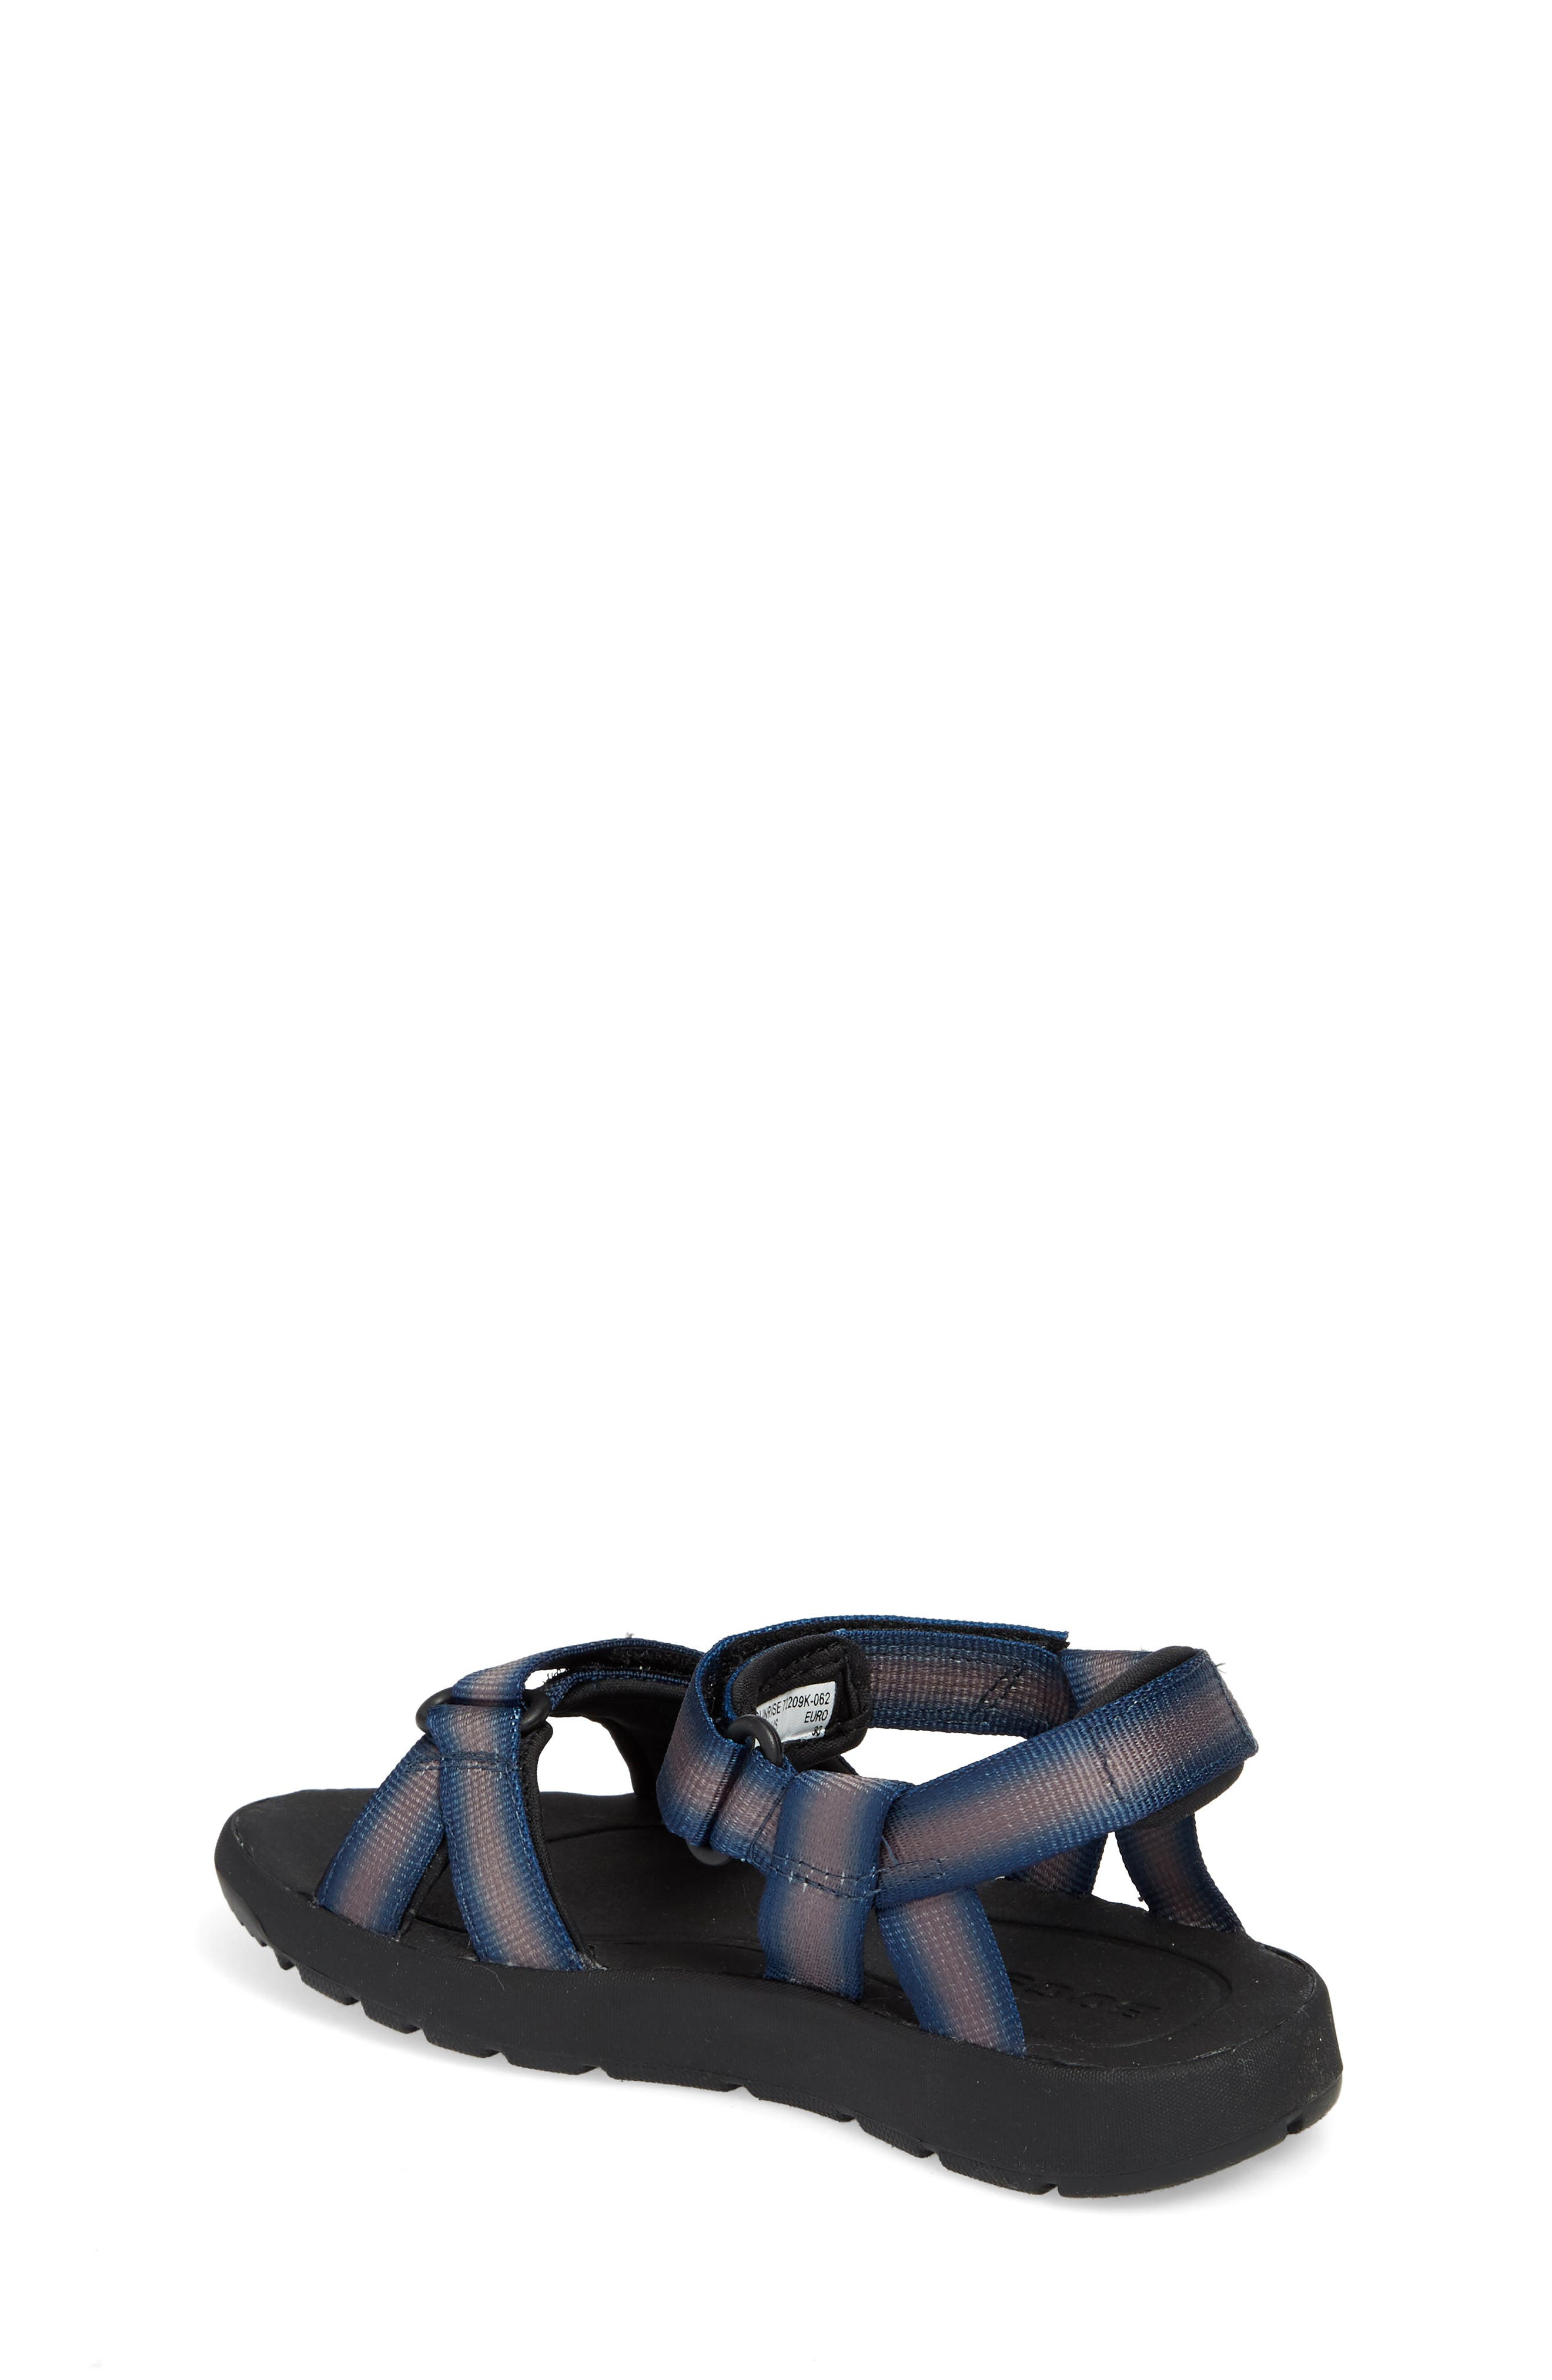 BOGS, Rio Sunrise Stripe Sandal, Alternate thumbnail 2, color, 062